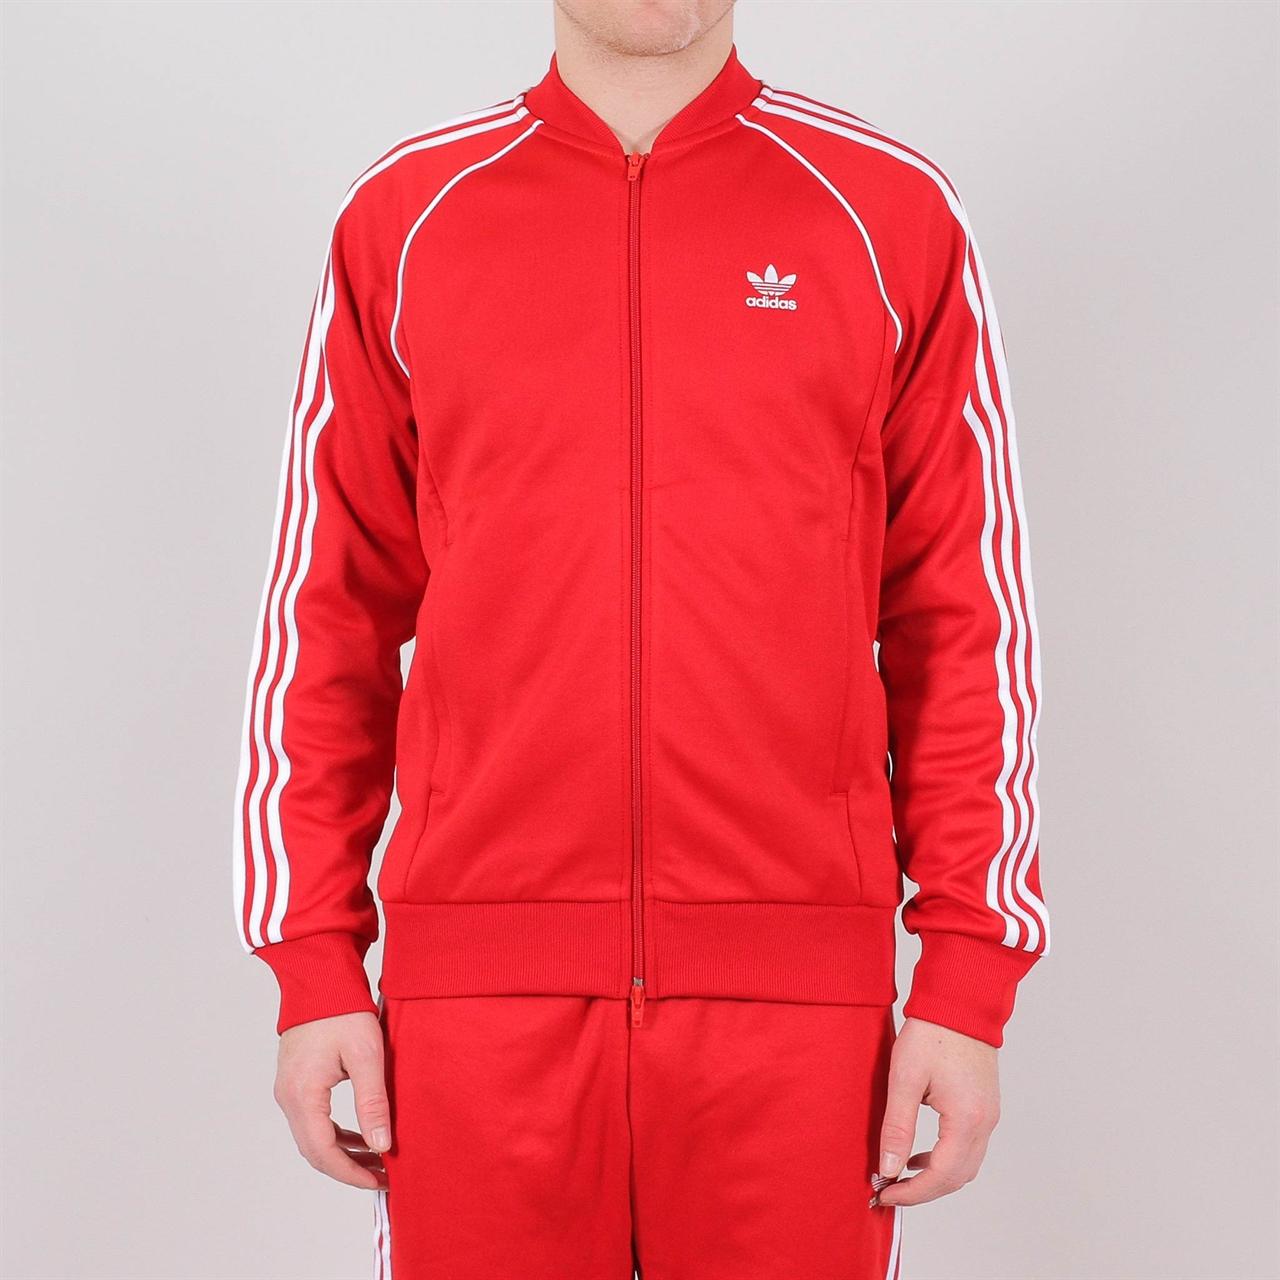 6ca7cdc7b8c8 Shelta - Adidas Originals Superstar Tracktop Red (DV1514)